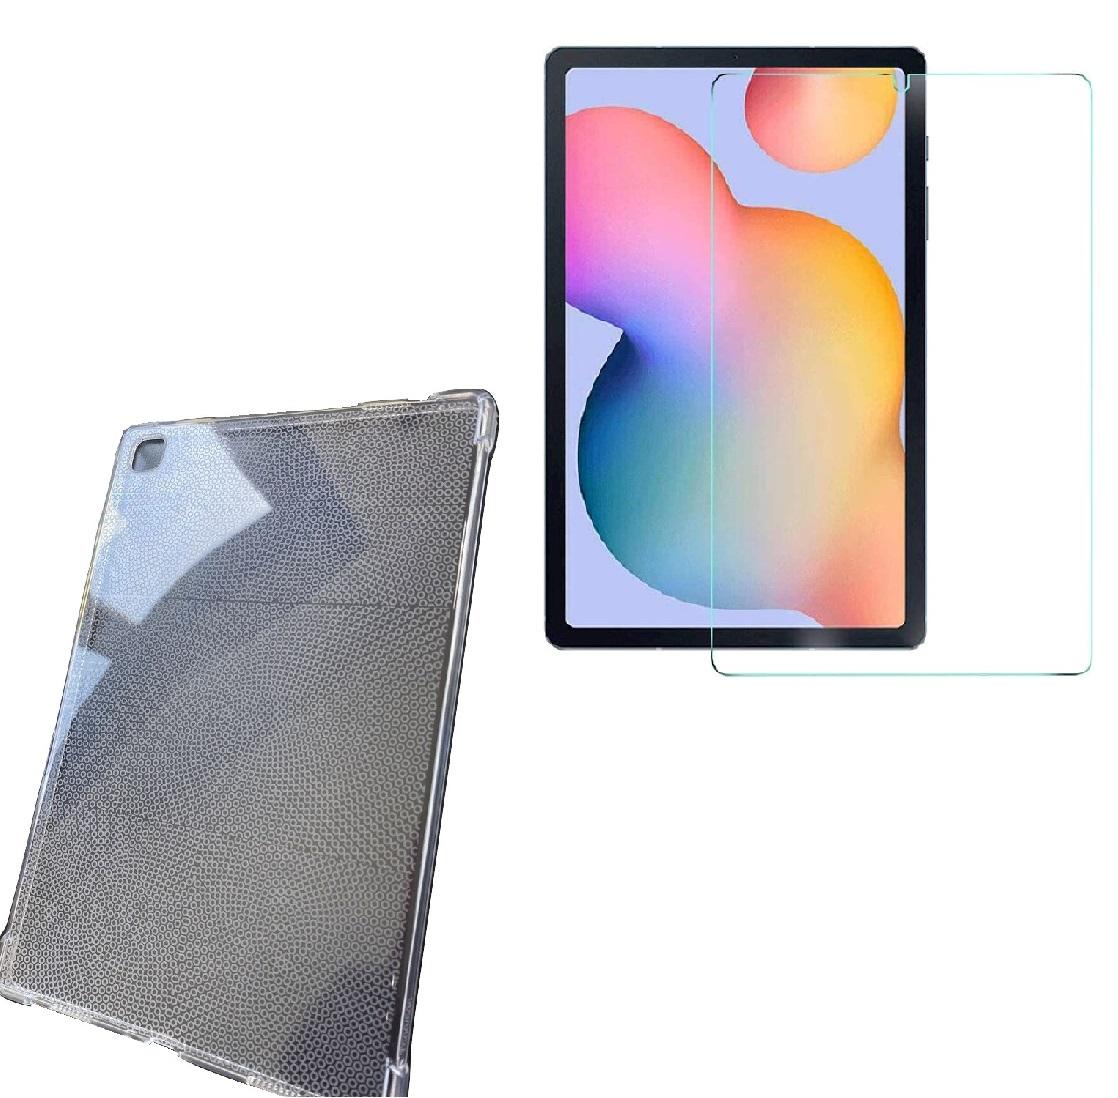 Kit Capa Tablet Samsung Galaxy Tab A7 10.4 T500 T505 Tpu Clear + Película Vidro